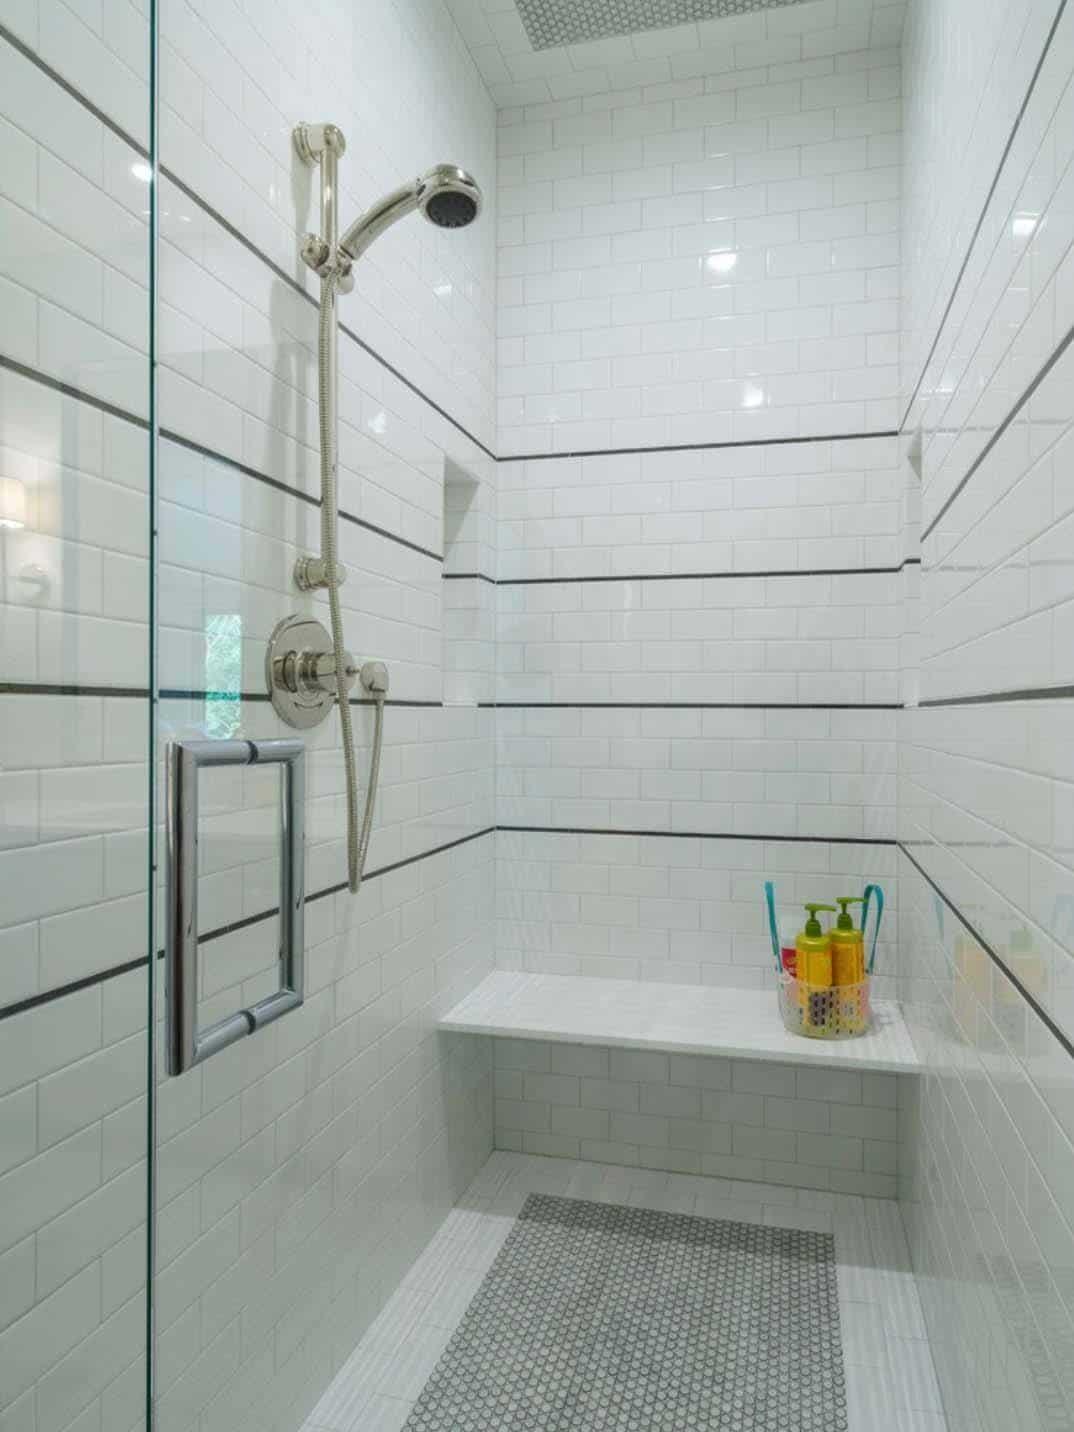 Modern Residence In Utah Showcases Exquisite Design Features